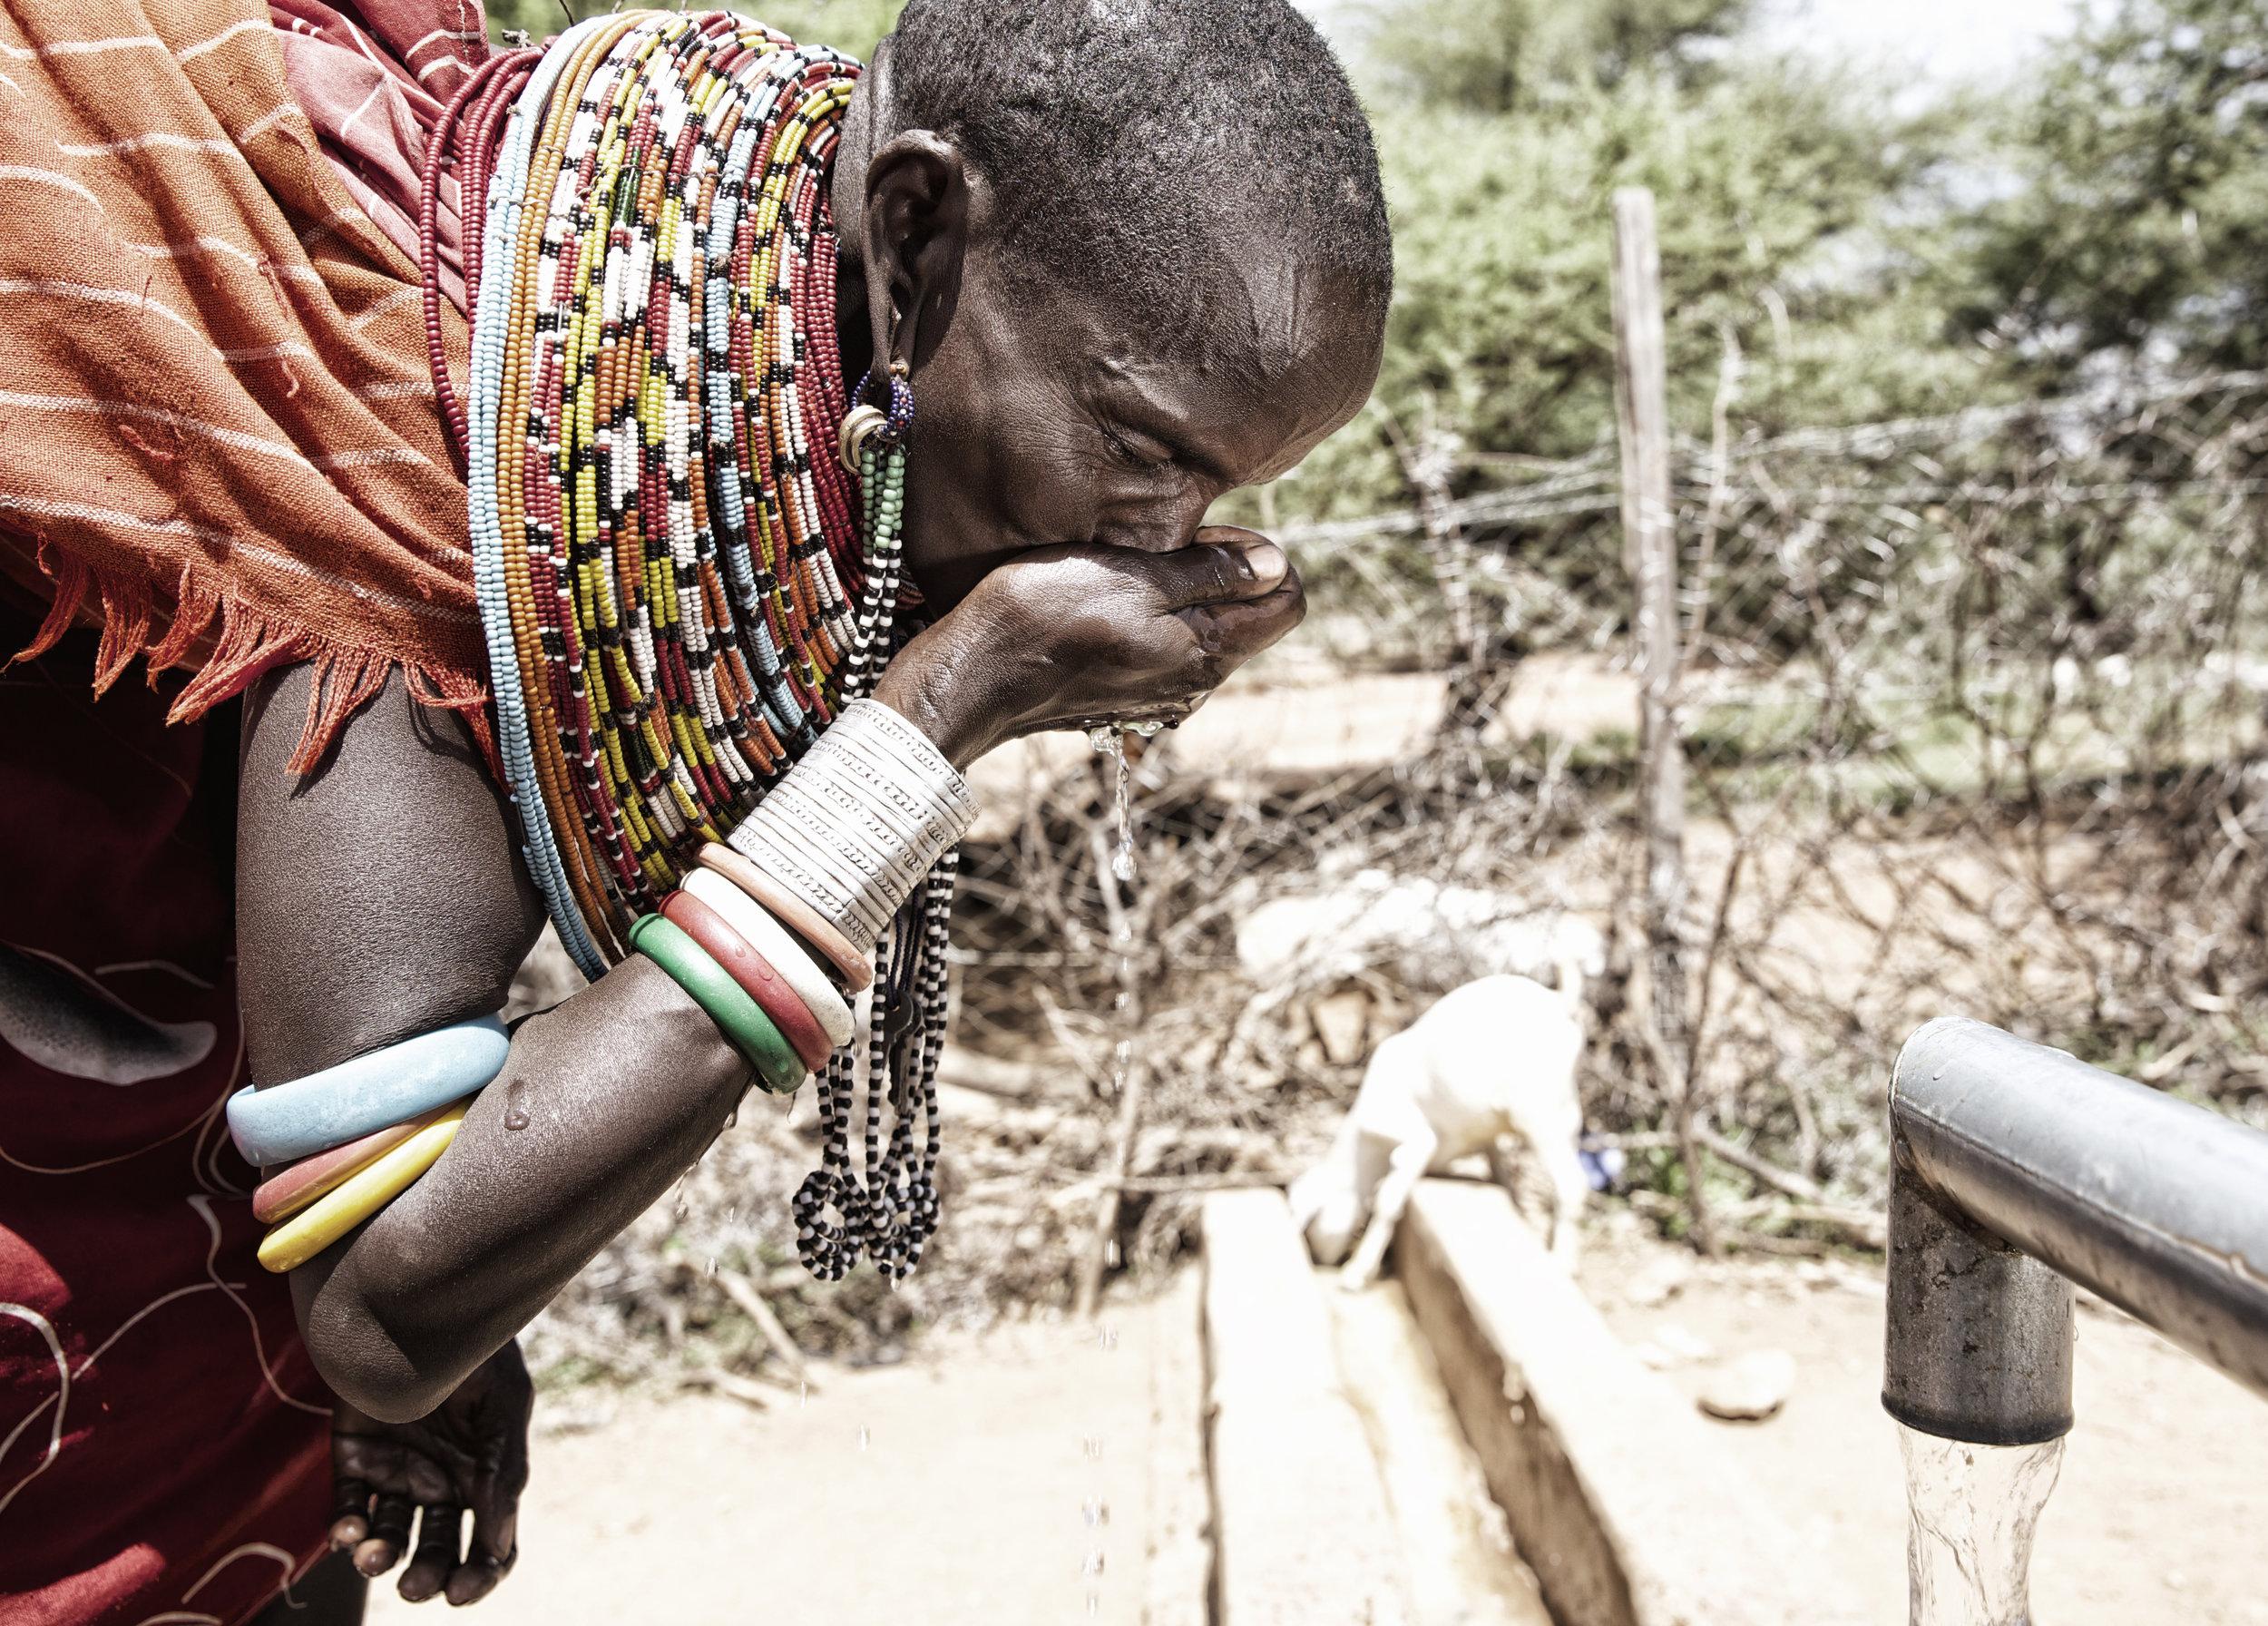 Woman Drinking Water from Well, Samburu Kenya Africa